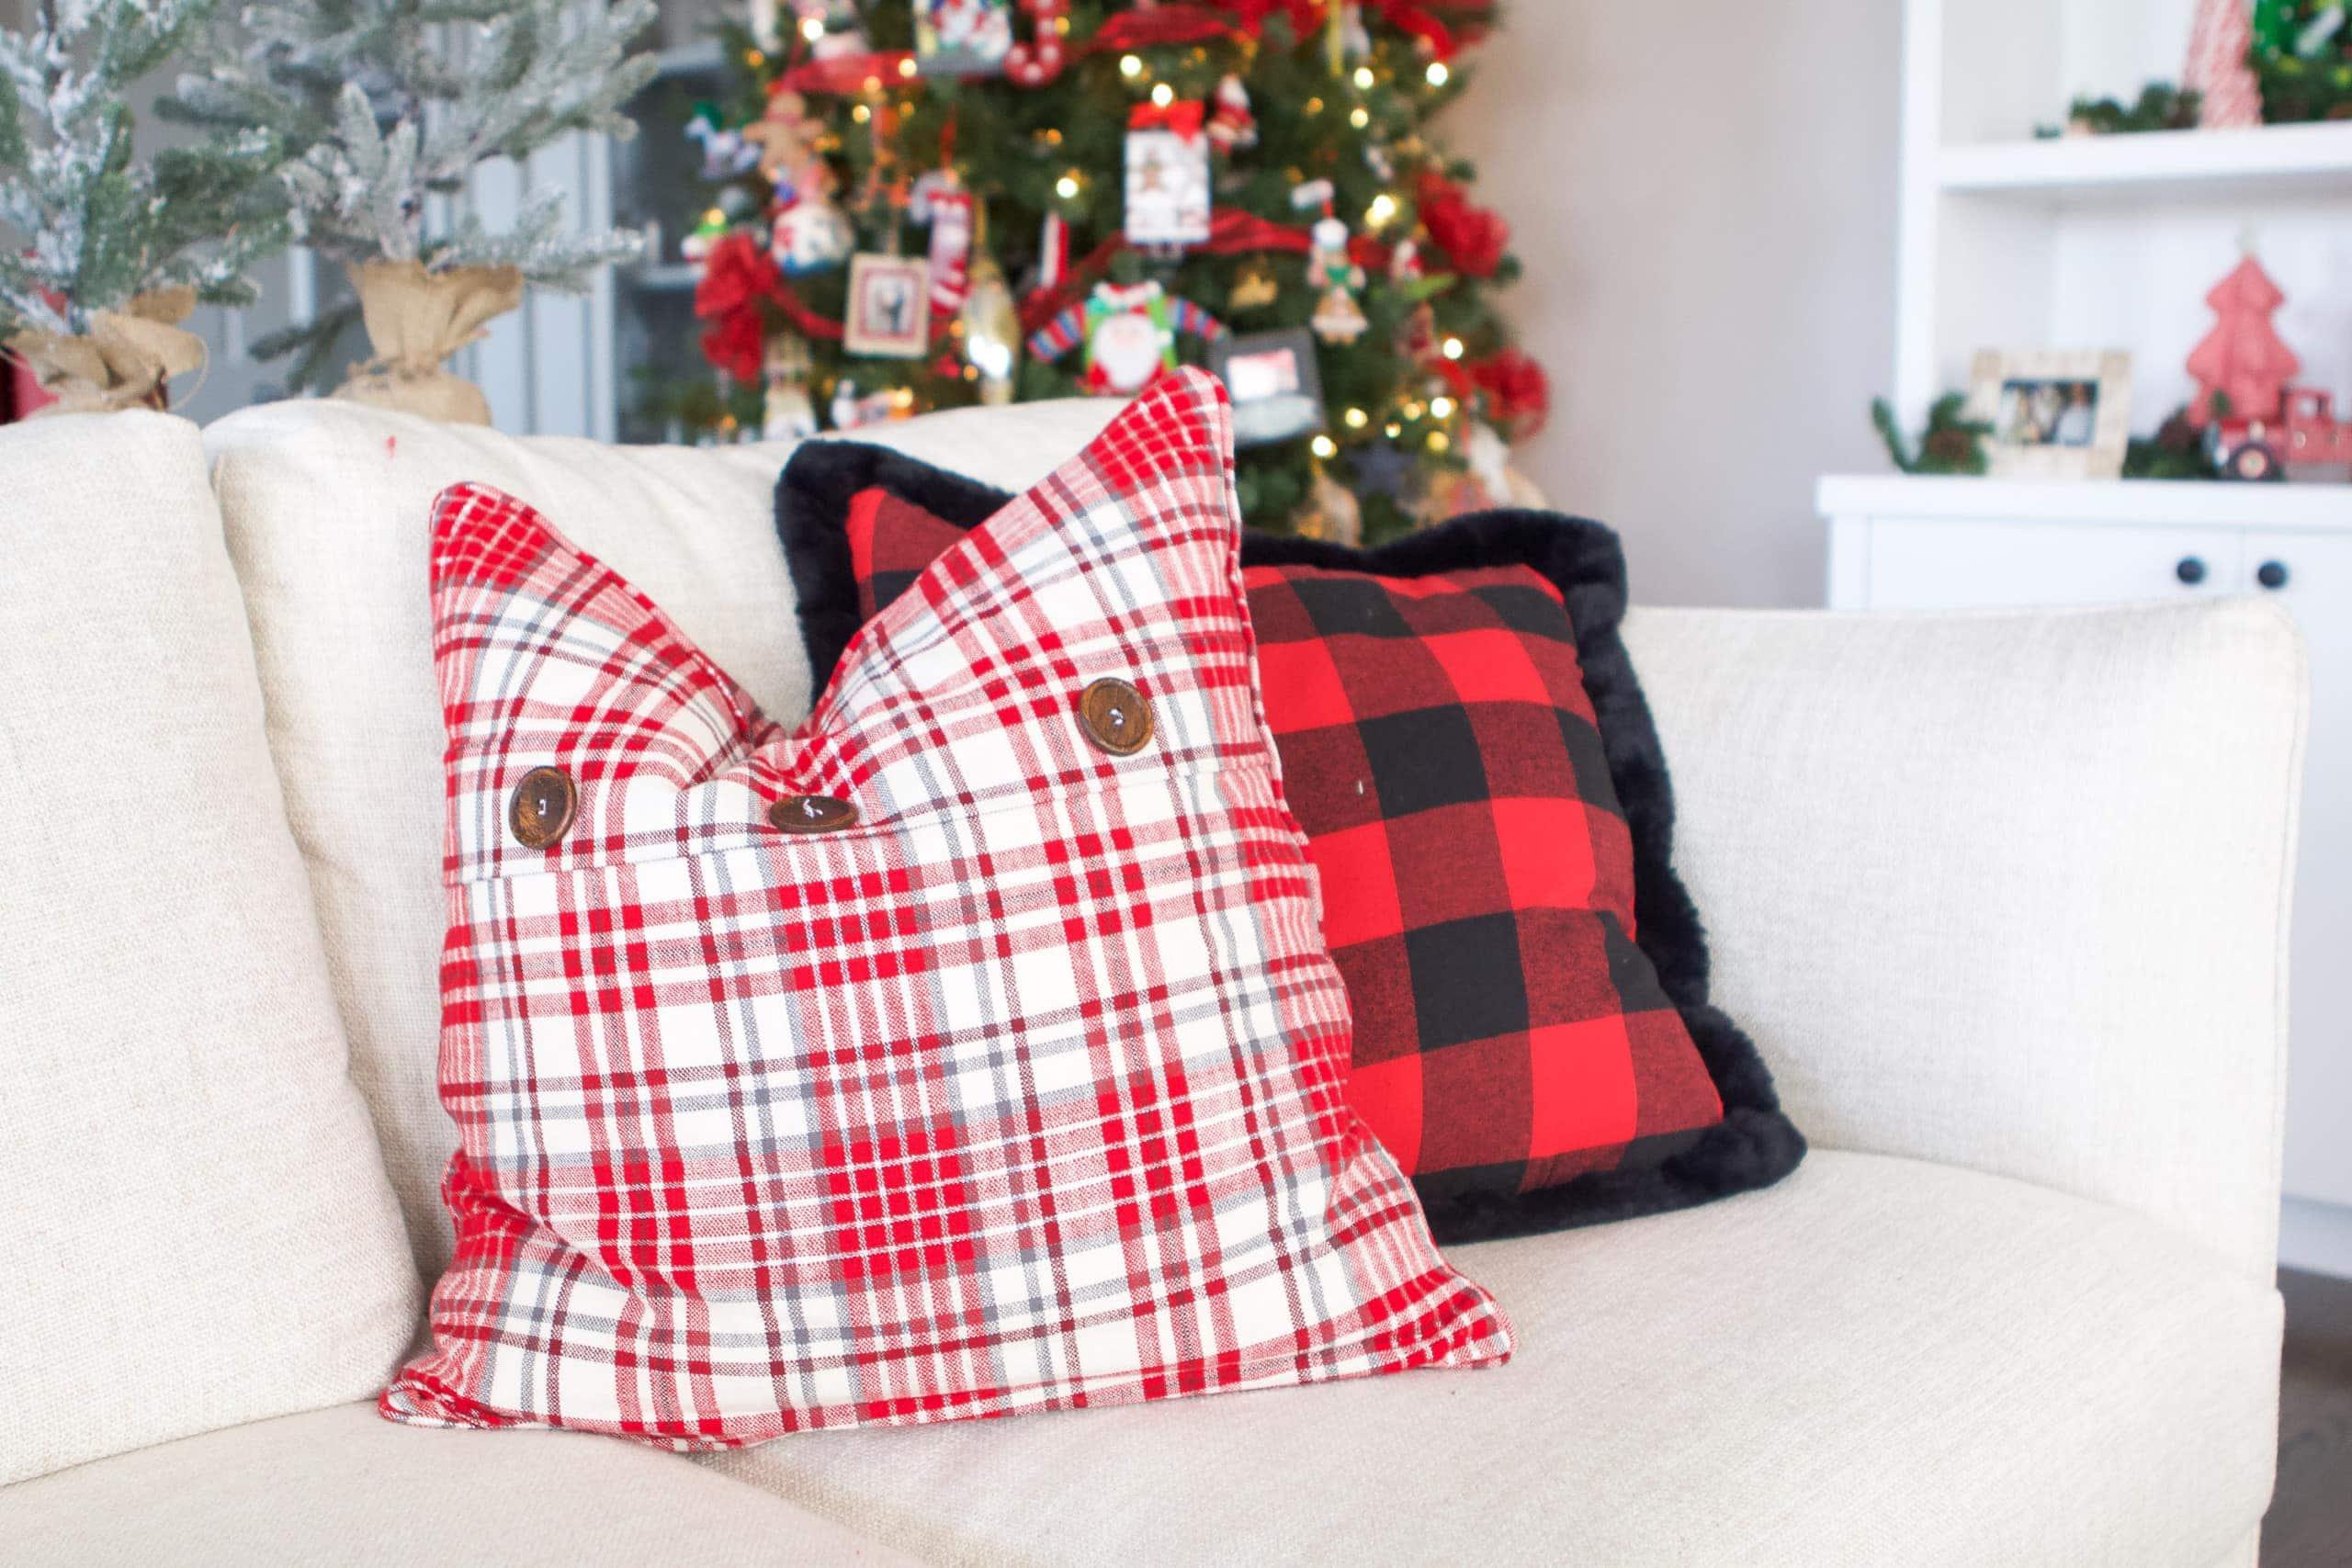 Jan's Christmas decorating tips